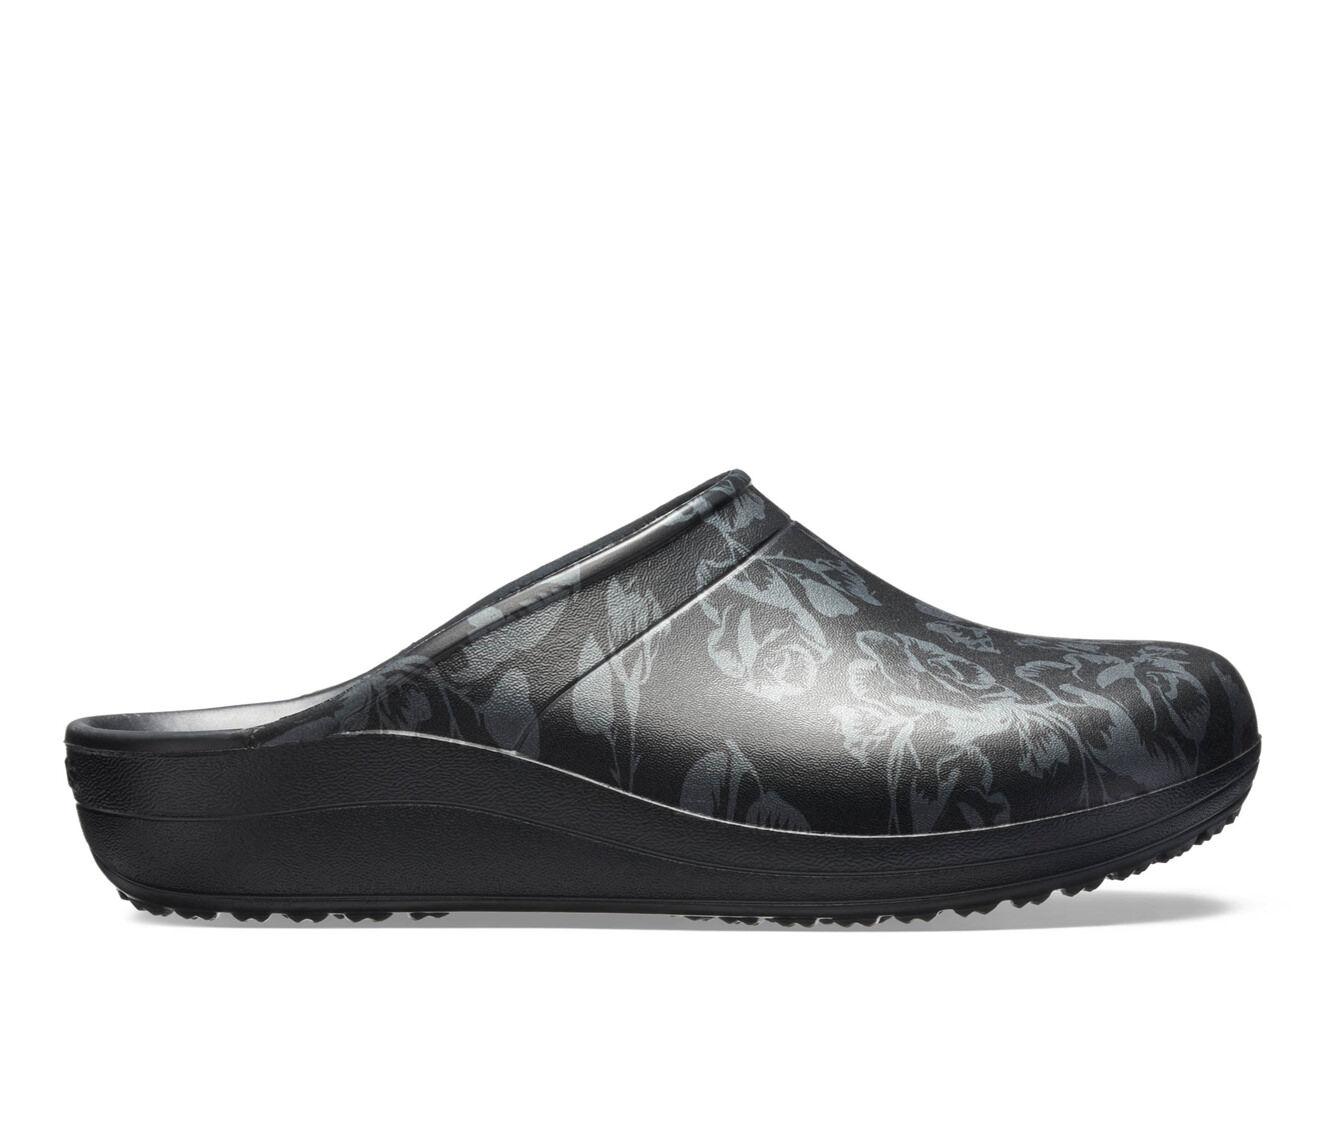 uk shoes_kd2664